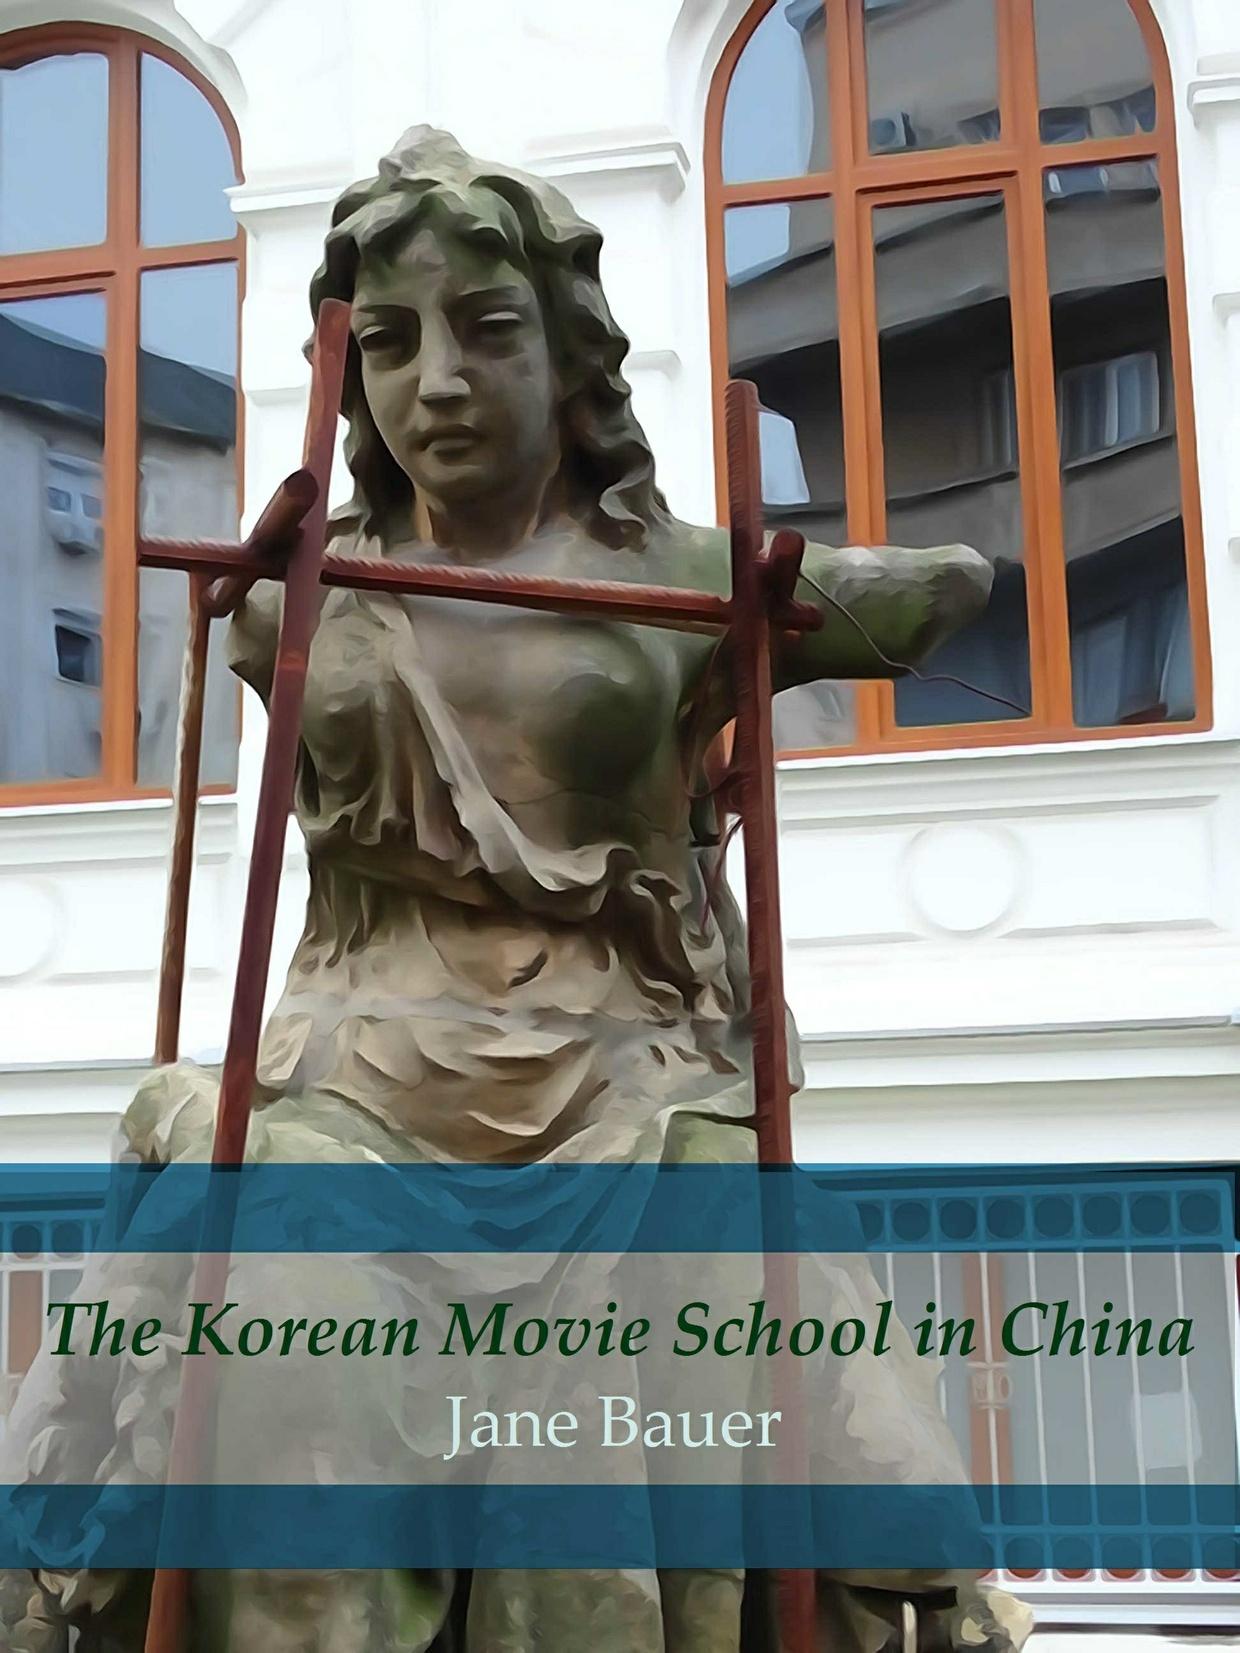 The Korean Movie School in China